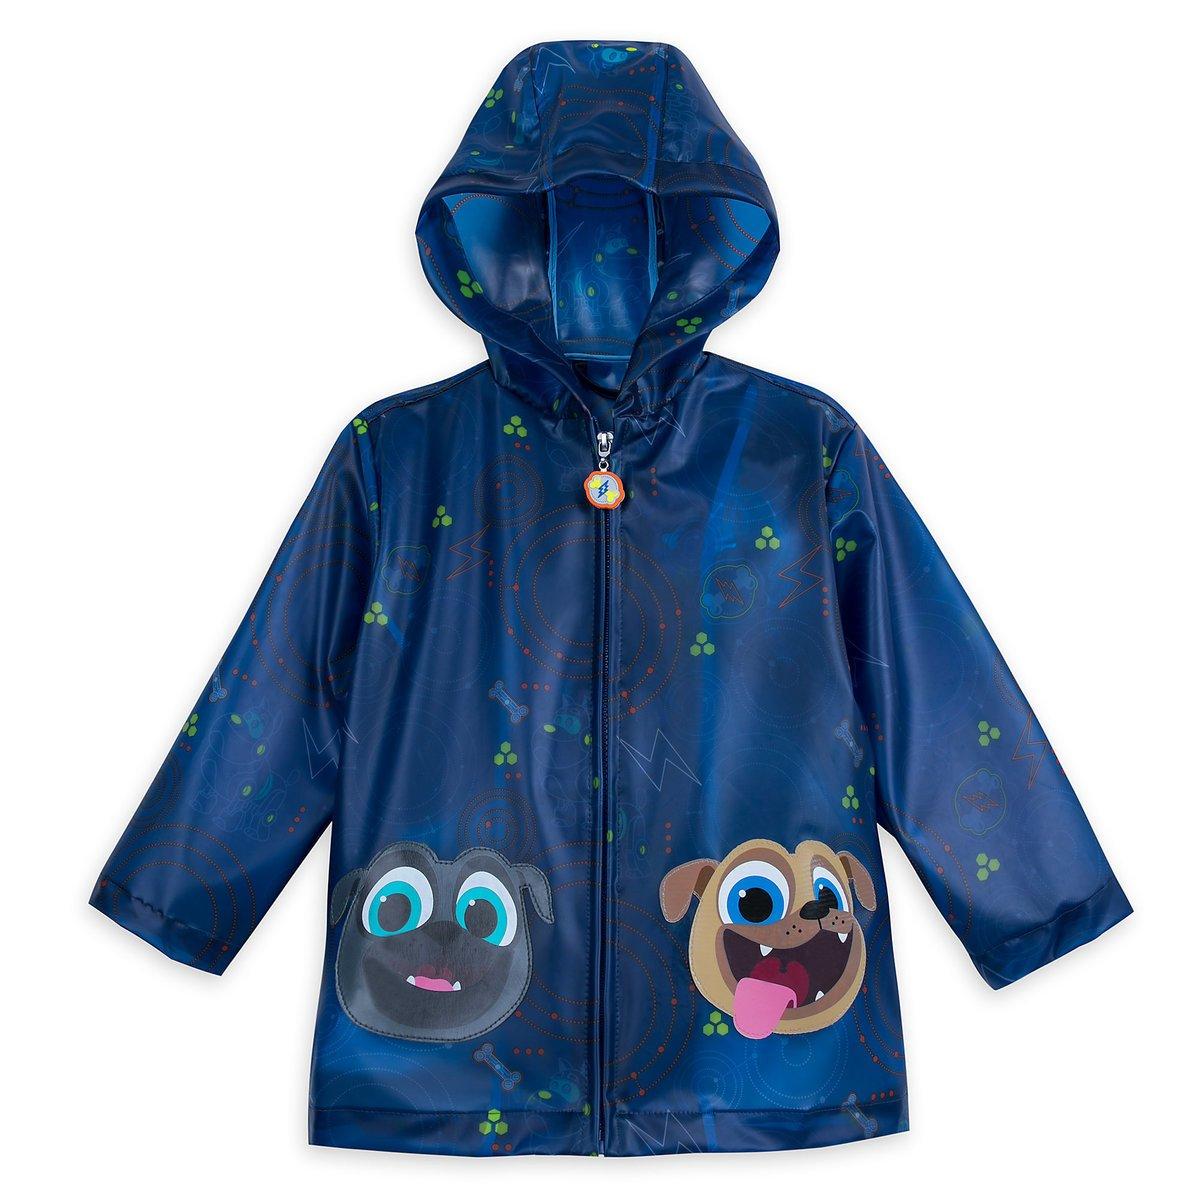 Disney Store Deluxe Puppy Dog Pals Rain Jacket Coat Size S Small 5-6 5T